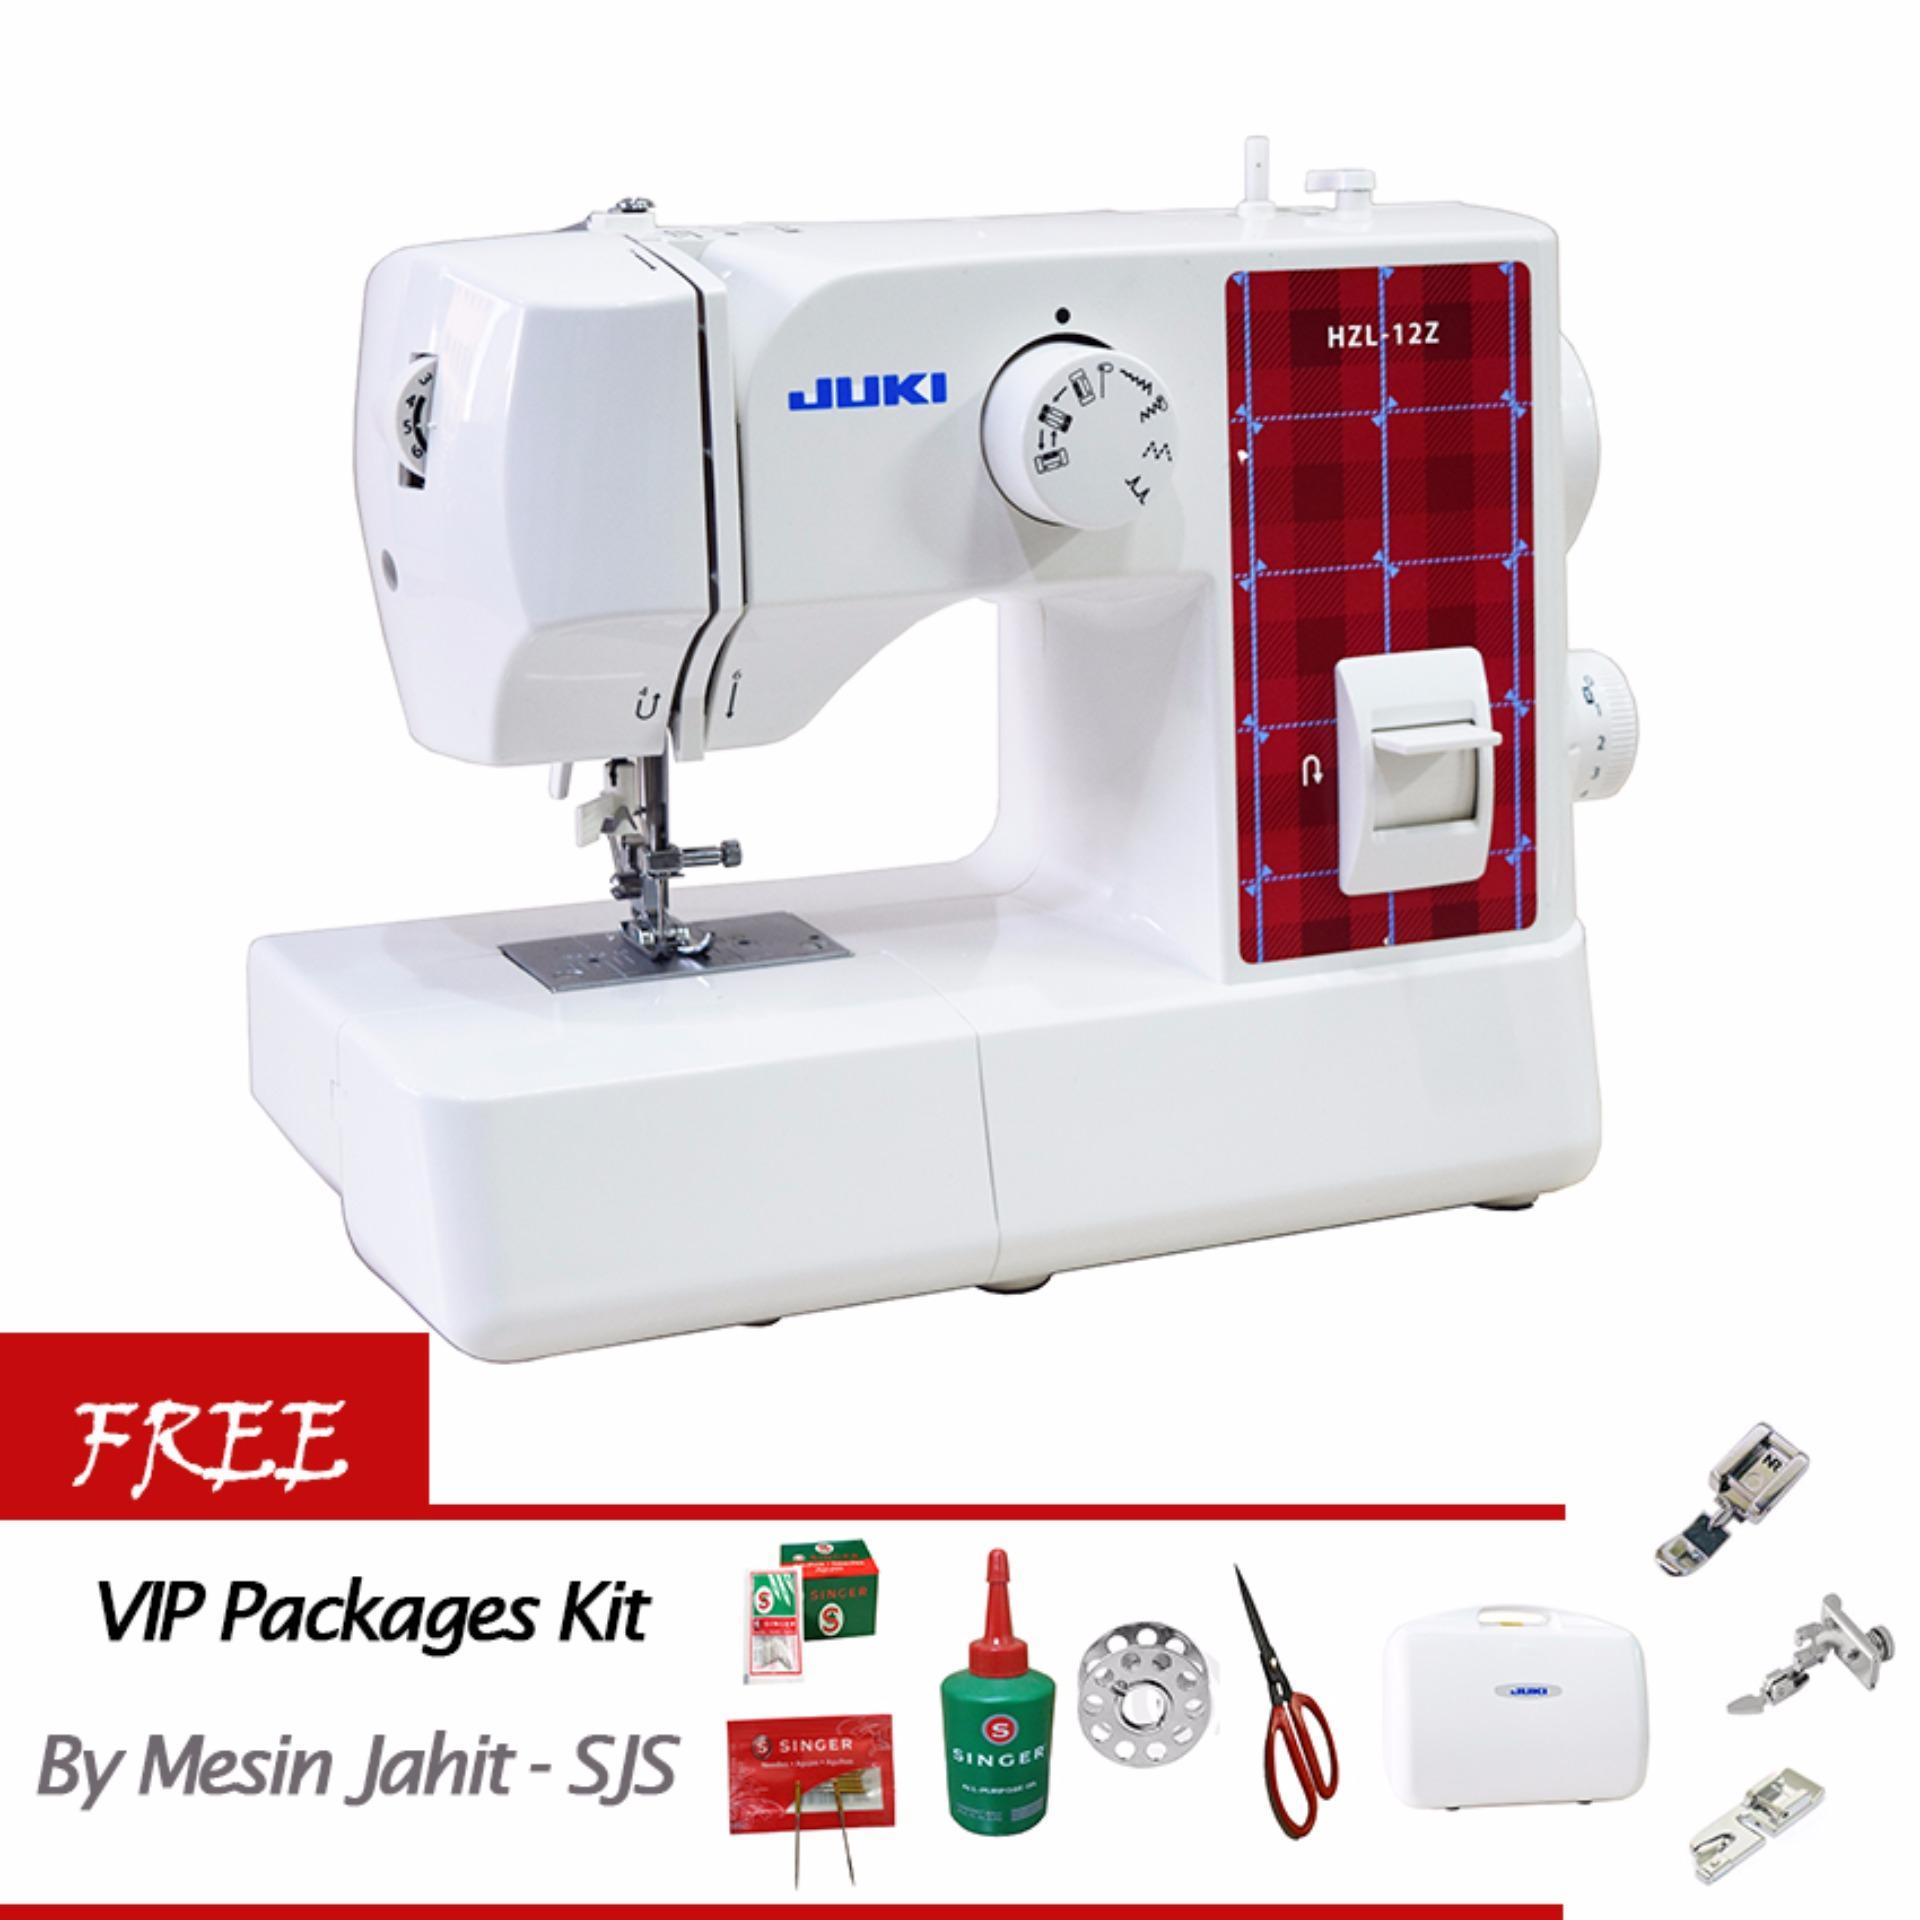 Harga Saya Juki Hzl 12z Mesin Jahit Portable Gratis Vip Packages Janome 2222 Multifungsi Kit